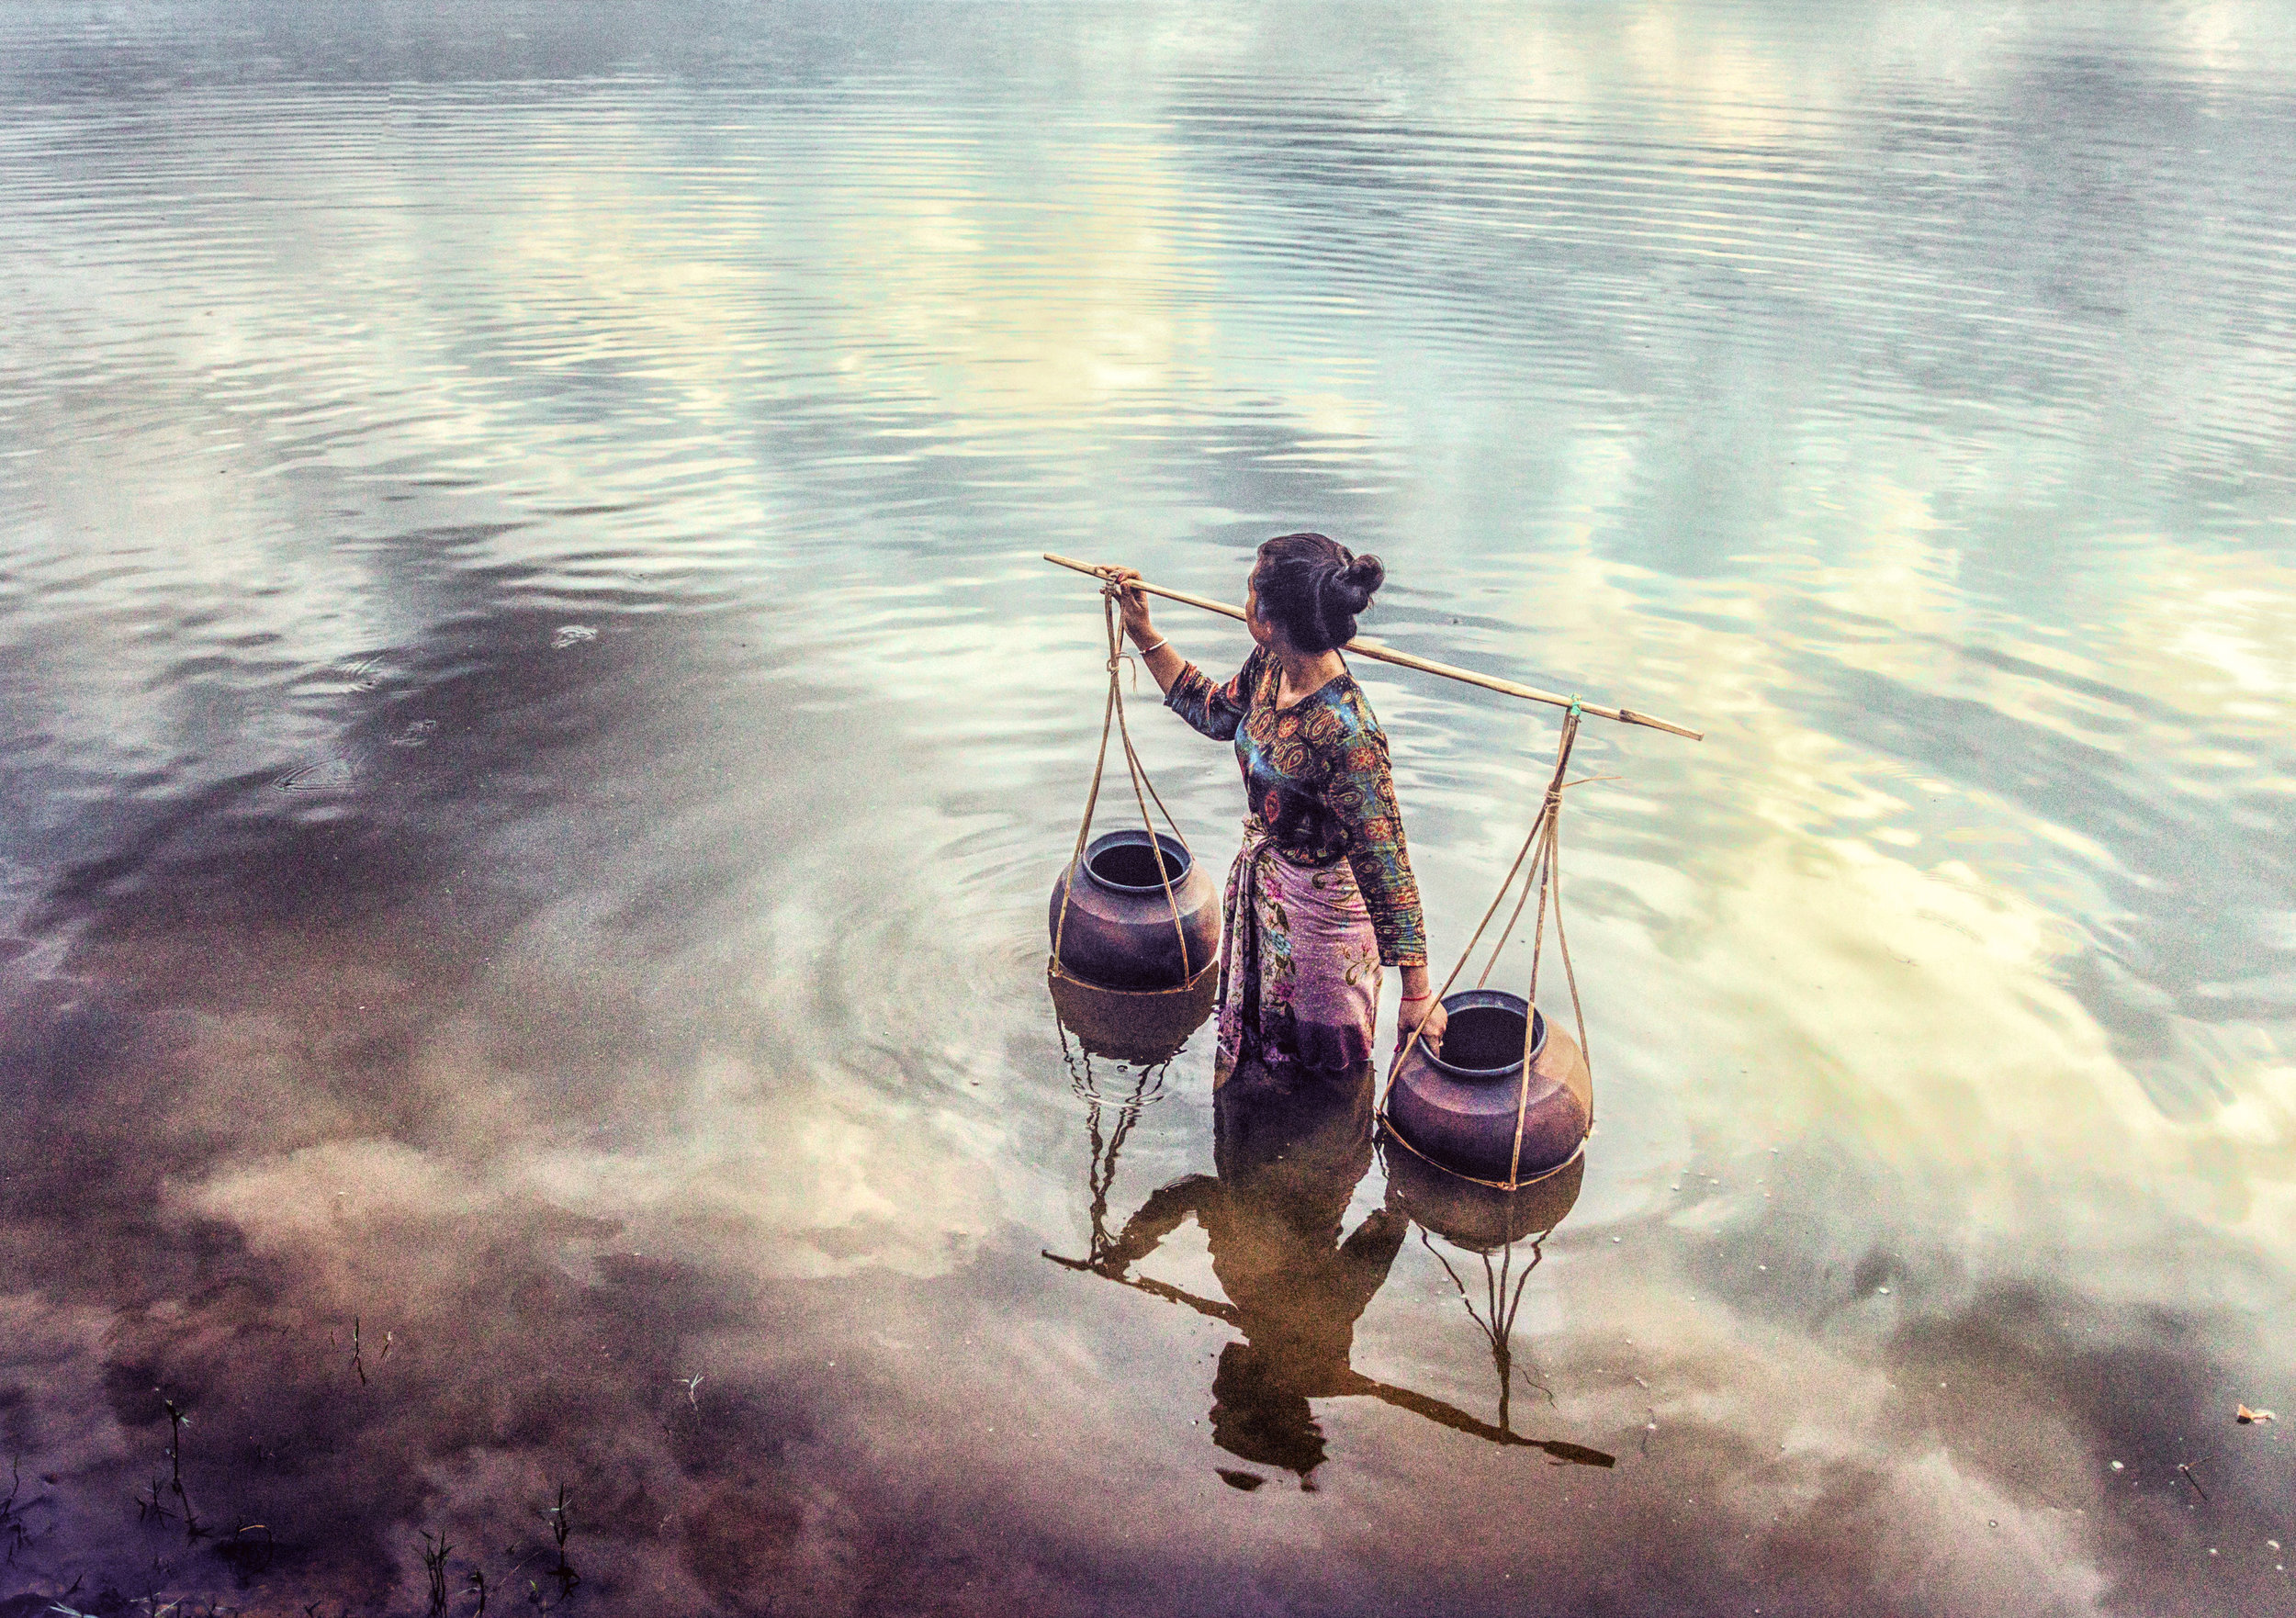 cambodia-2.jpg